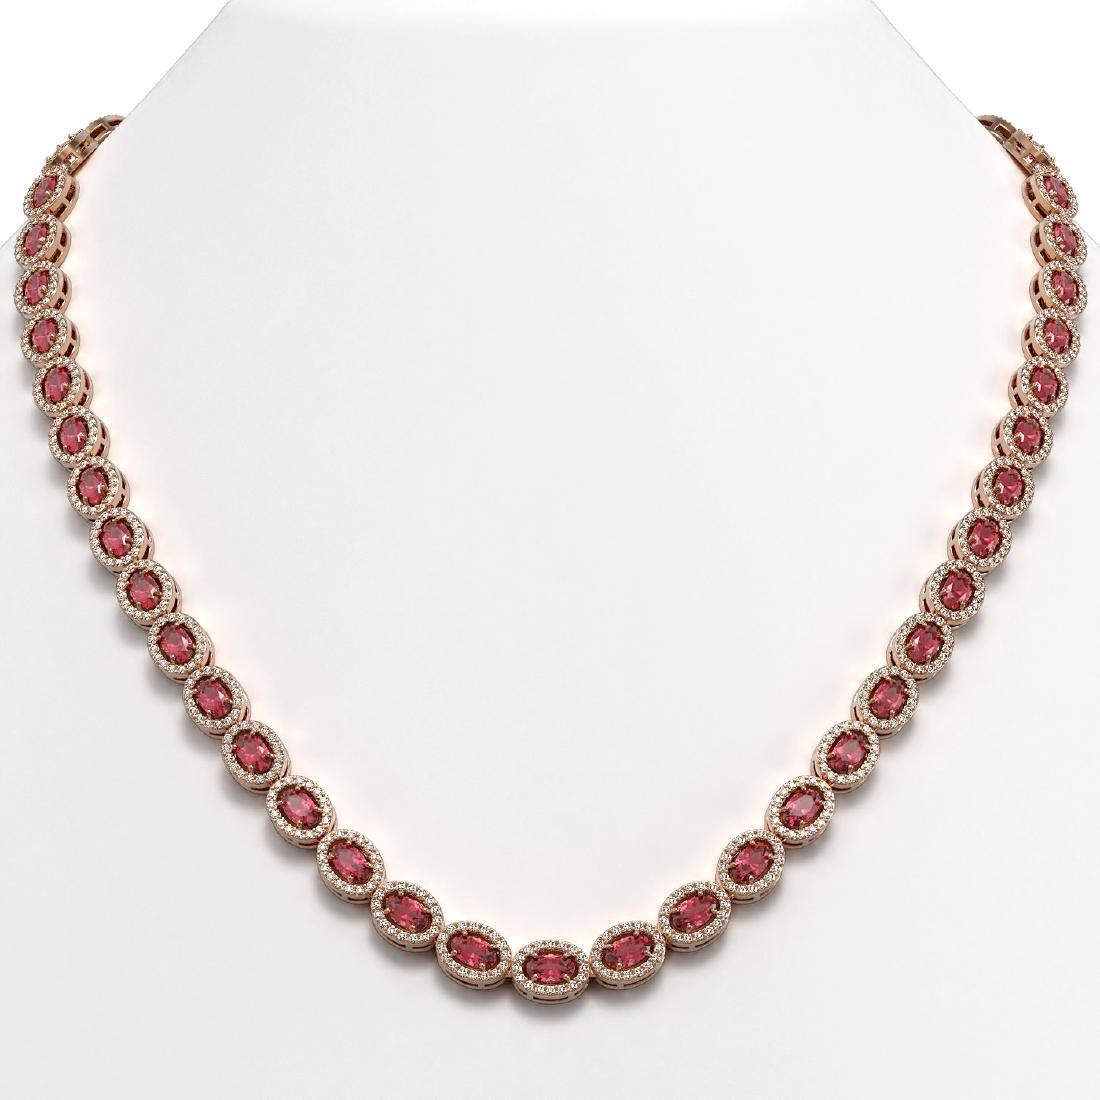 23.57 CTW Tourmaline & Diamond Halo Necklace 10K Rose